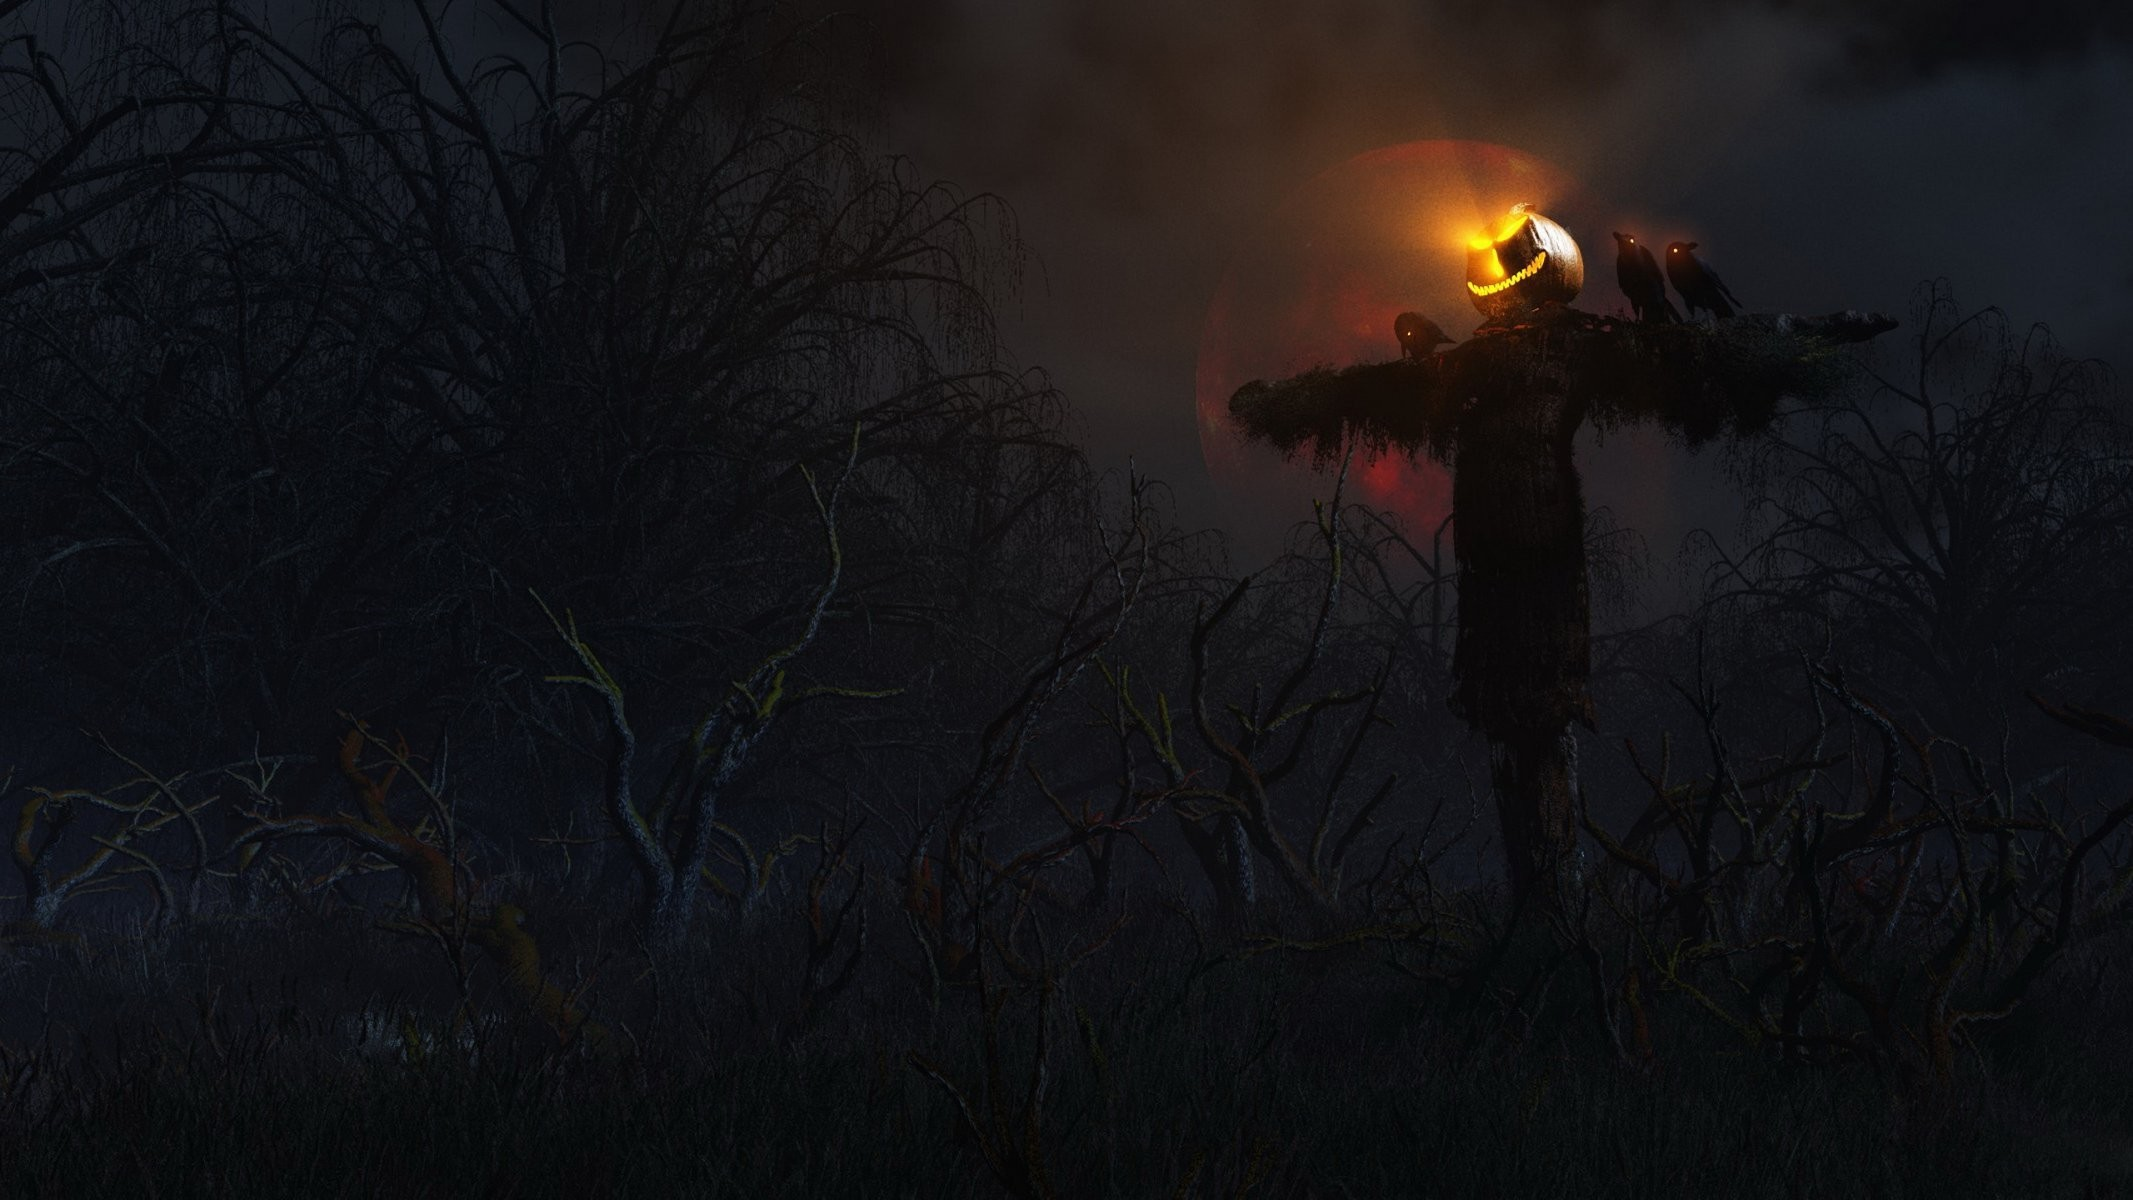 wallpapers from lolita777 halloween pumpkin stuffed head forest darkly  scared creepy night raven moon forest tree